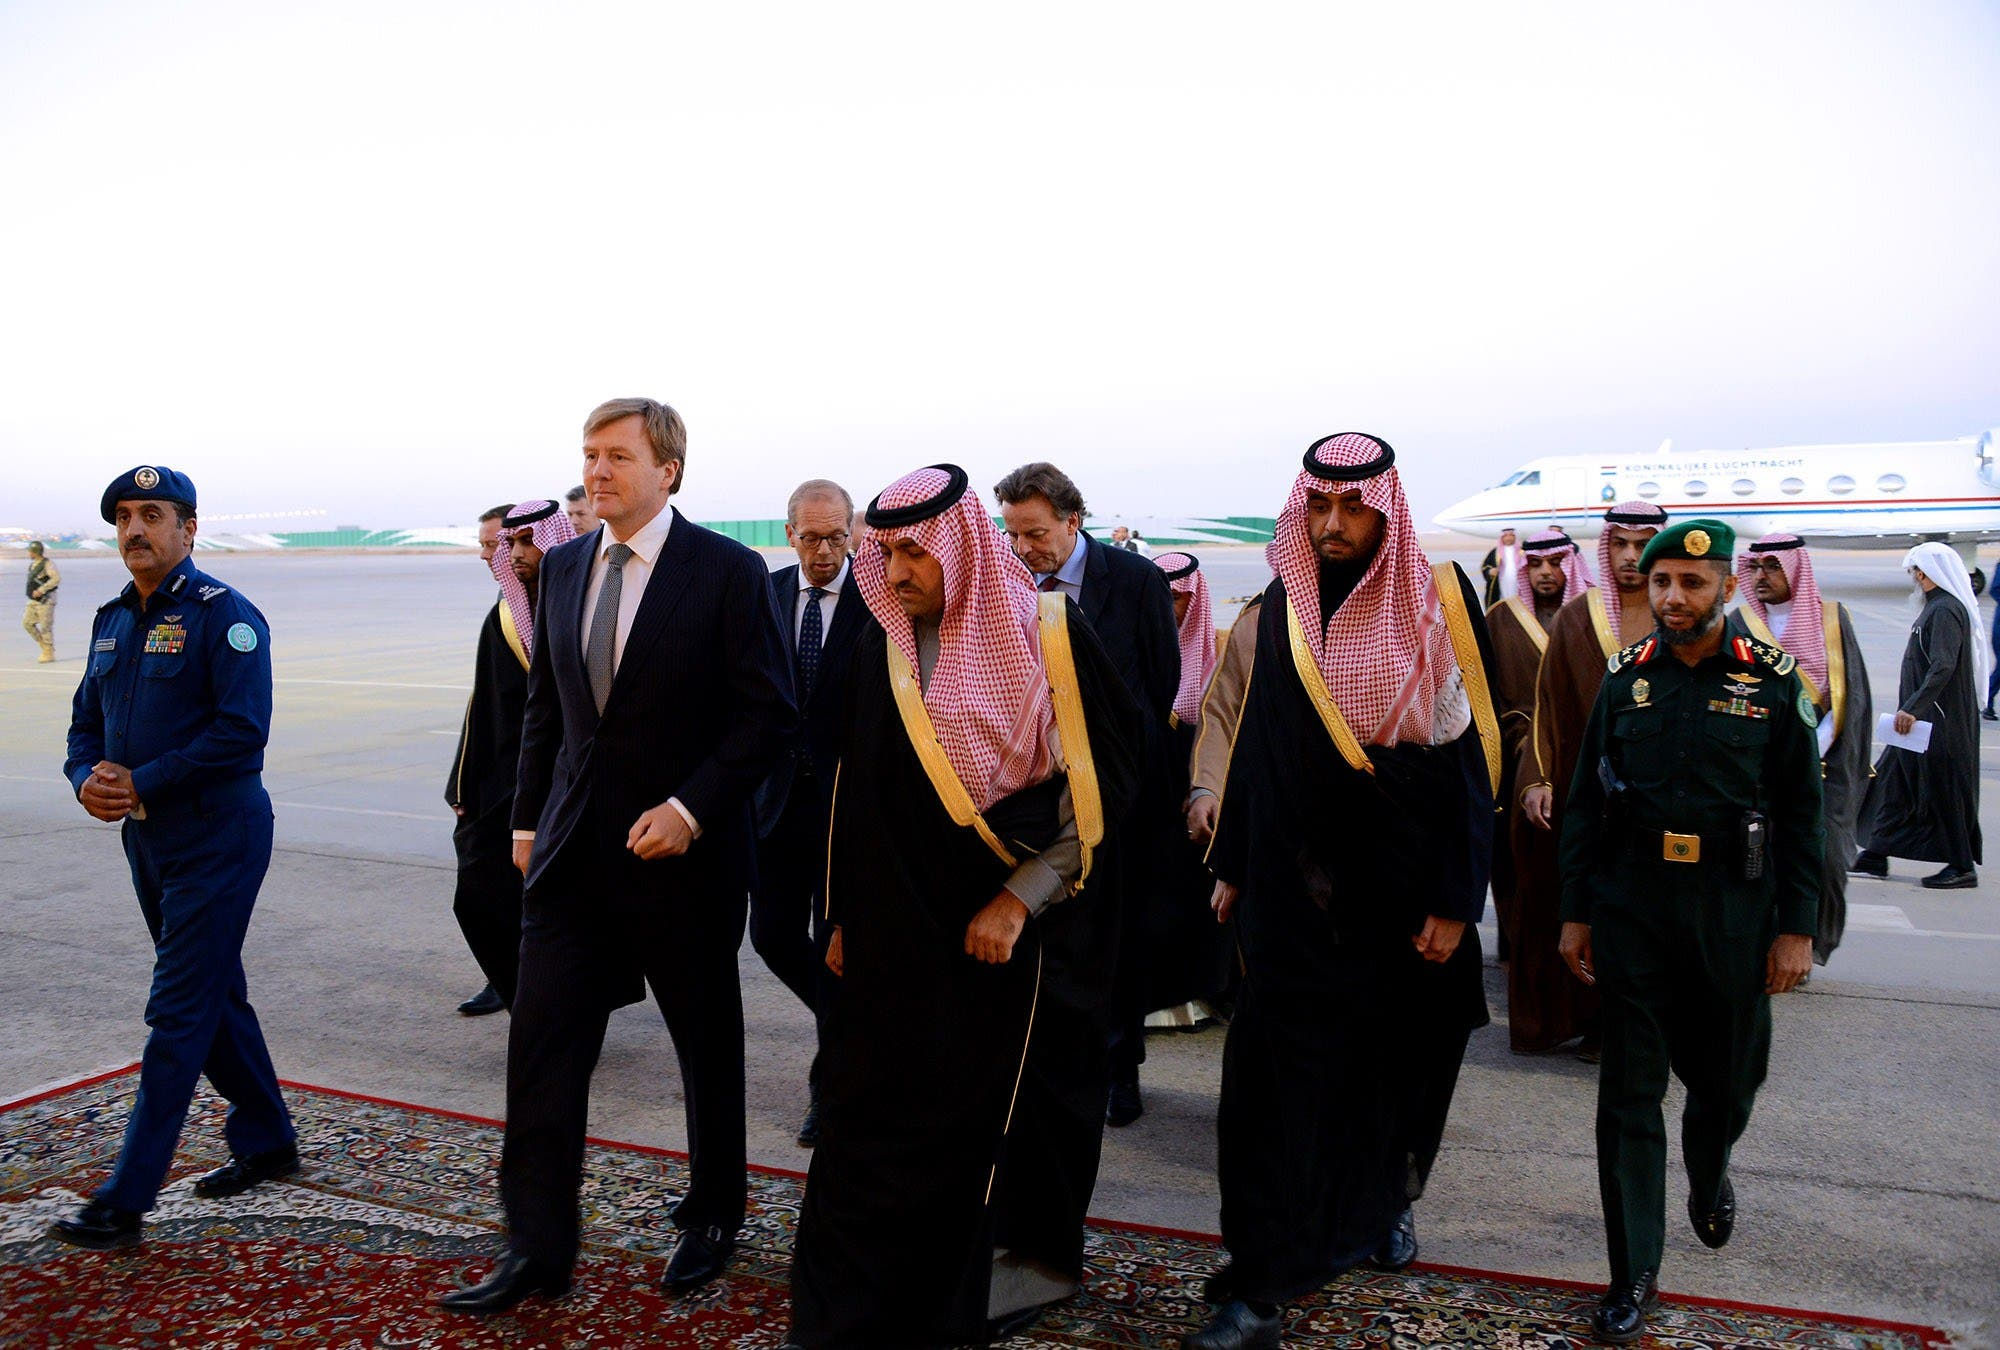 Saudi Prince and Emir of Riyadh Turki bin Abdullah bin Abdelaziz (C) welcoming Dutch King Willem-Alexander (2nd--L) upon his arrival in Riyadh. (AFP)